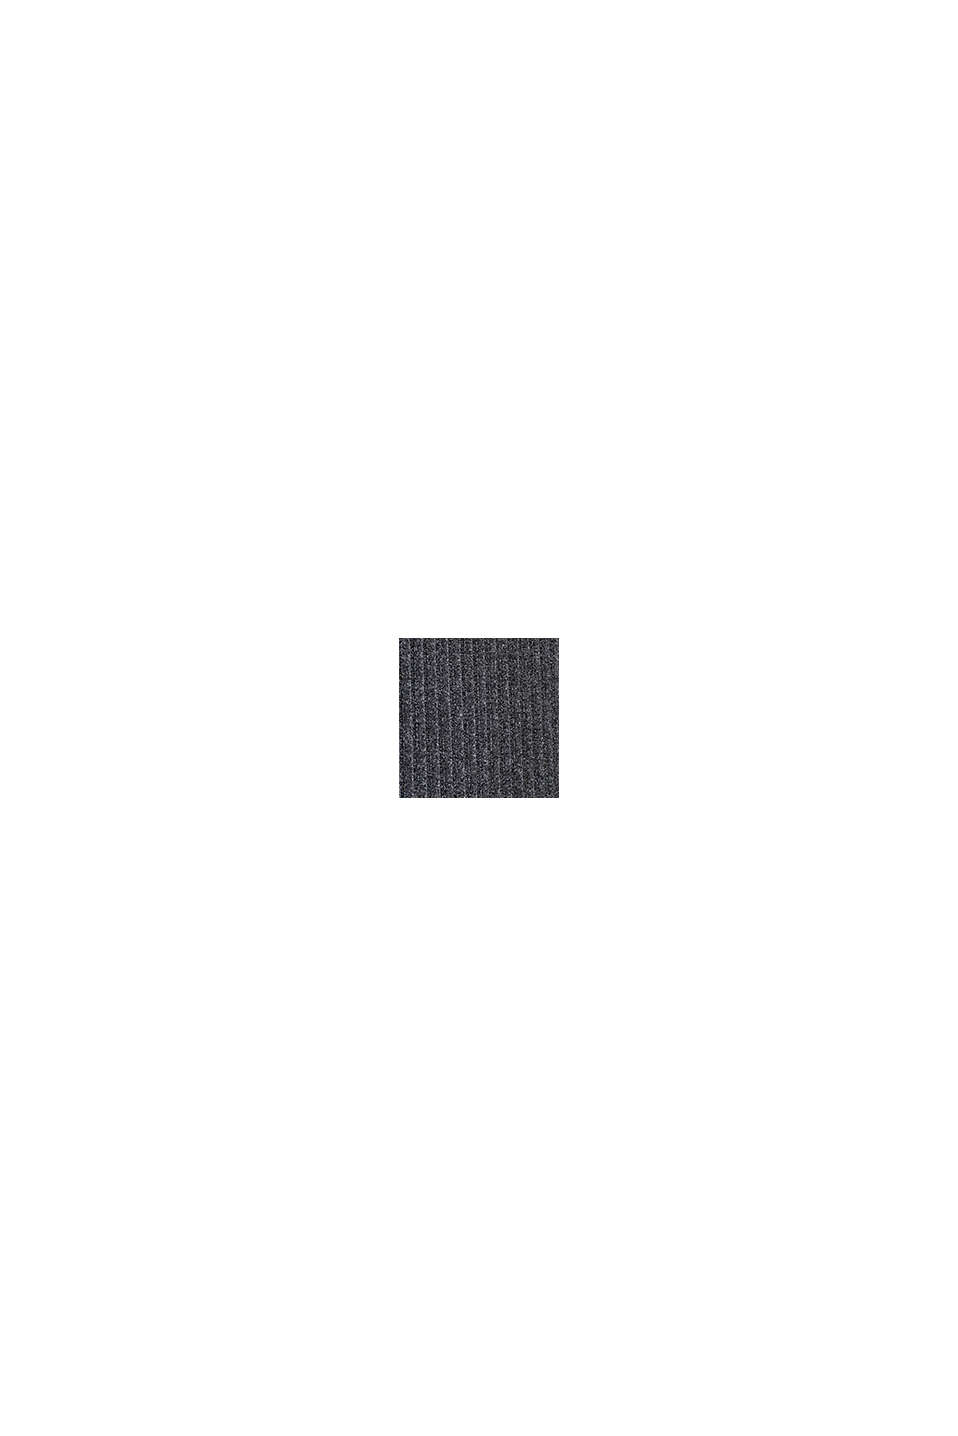 Gerippter Jersey-Stretch-Cardigan, recycelt, ANTHRACITE, swatch